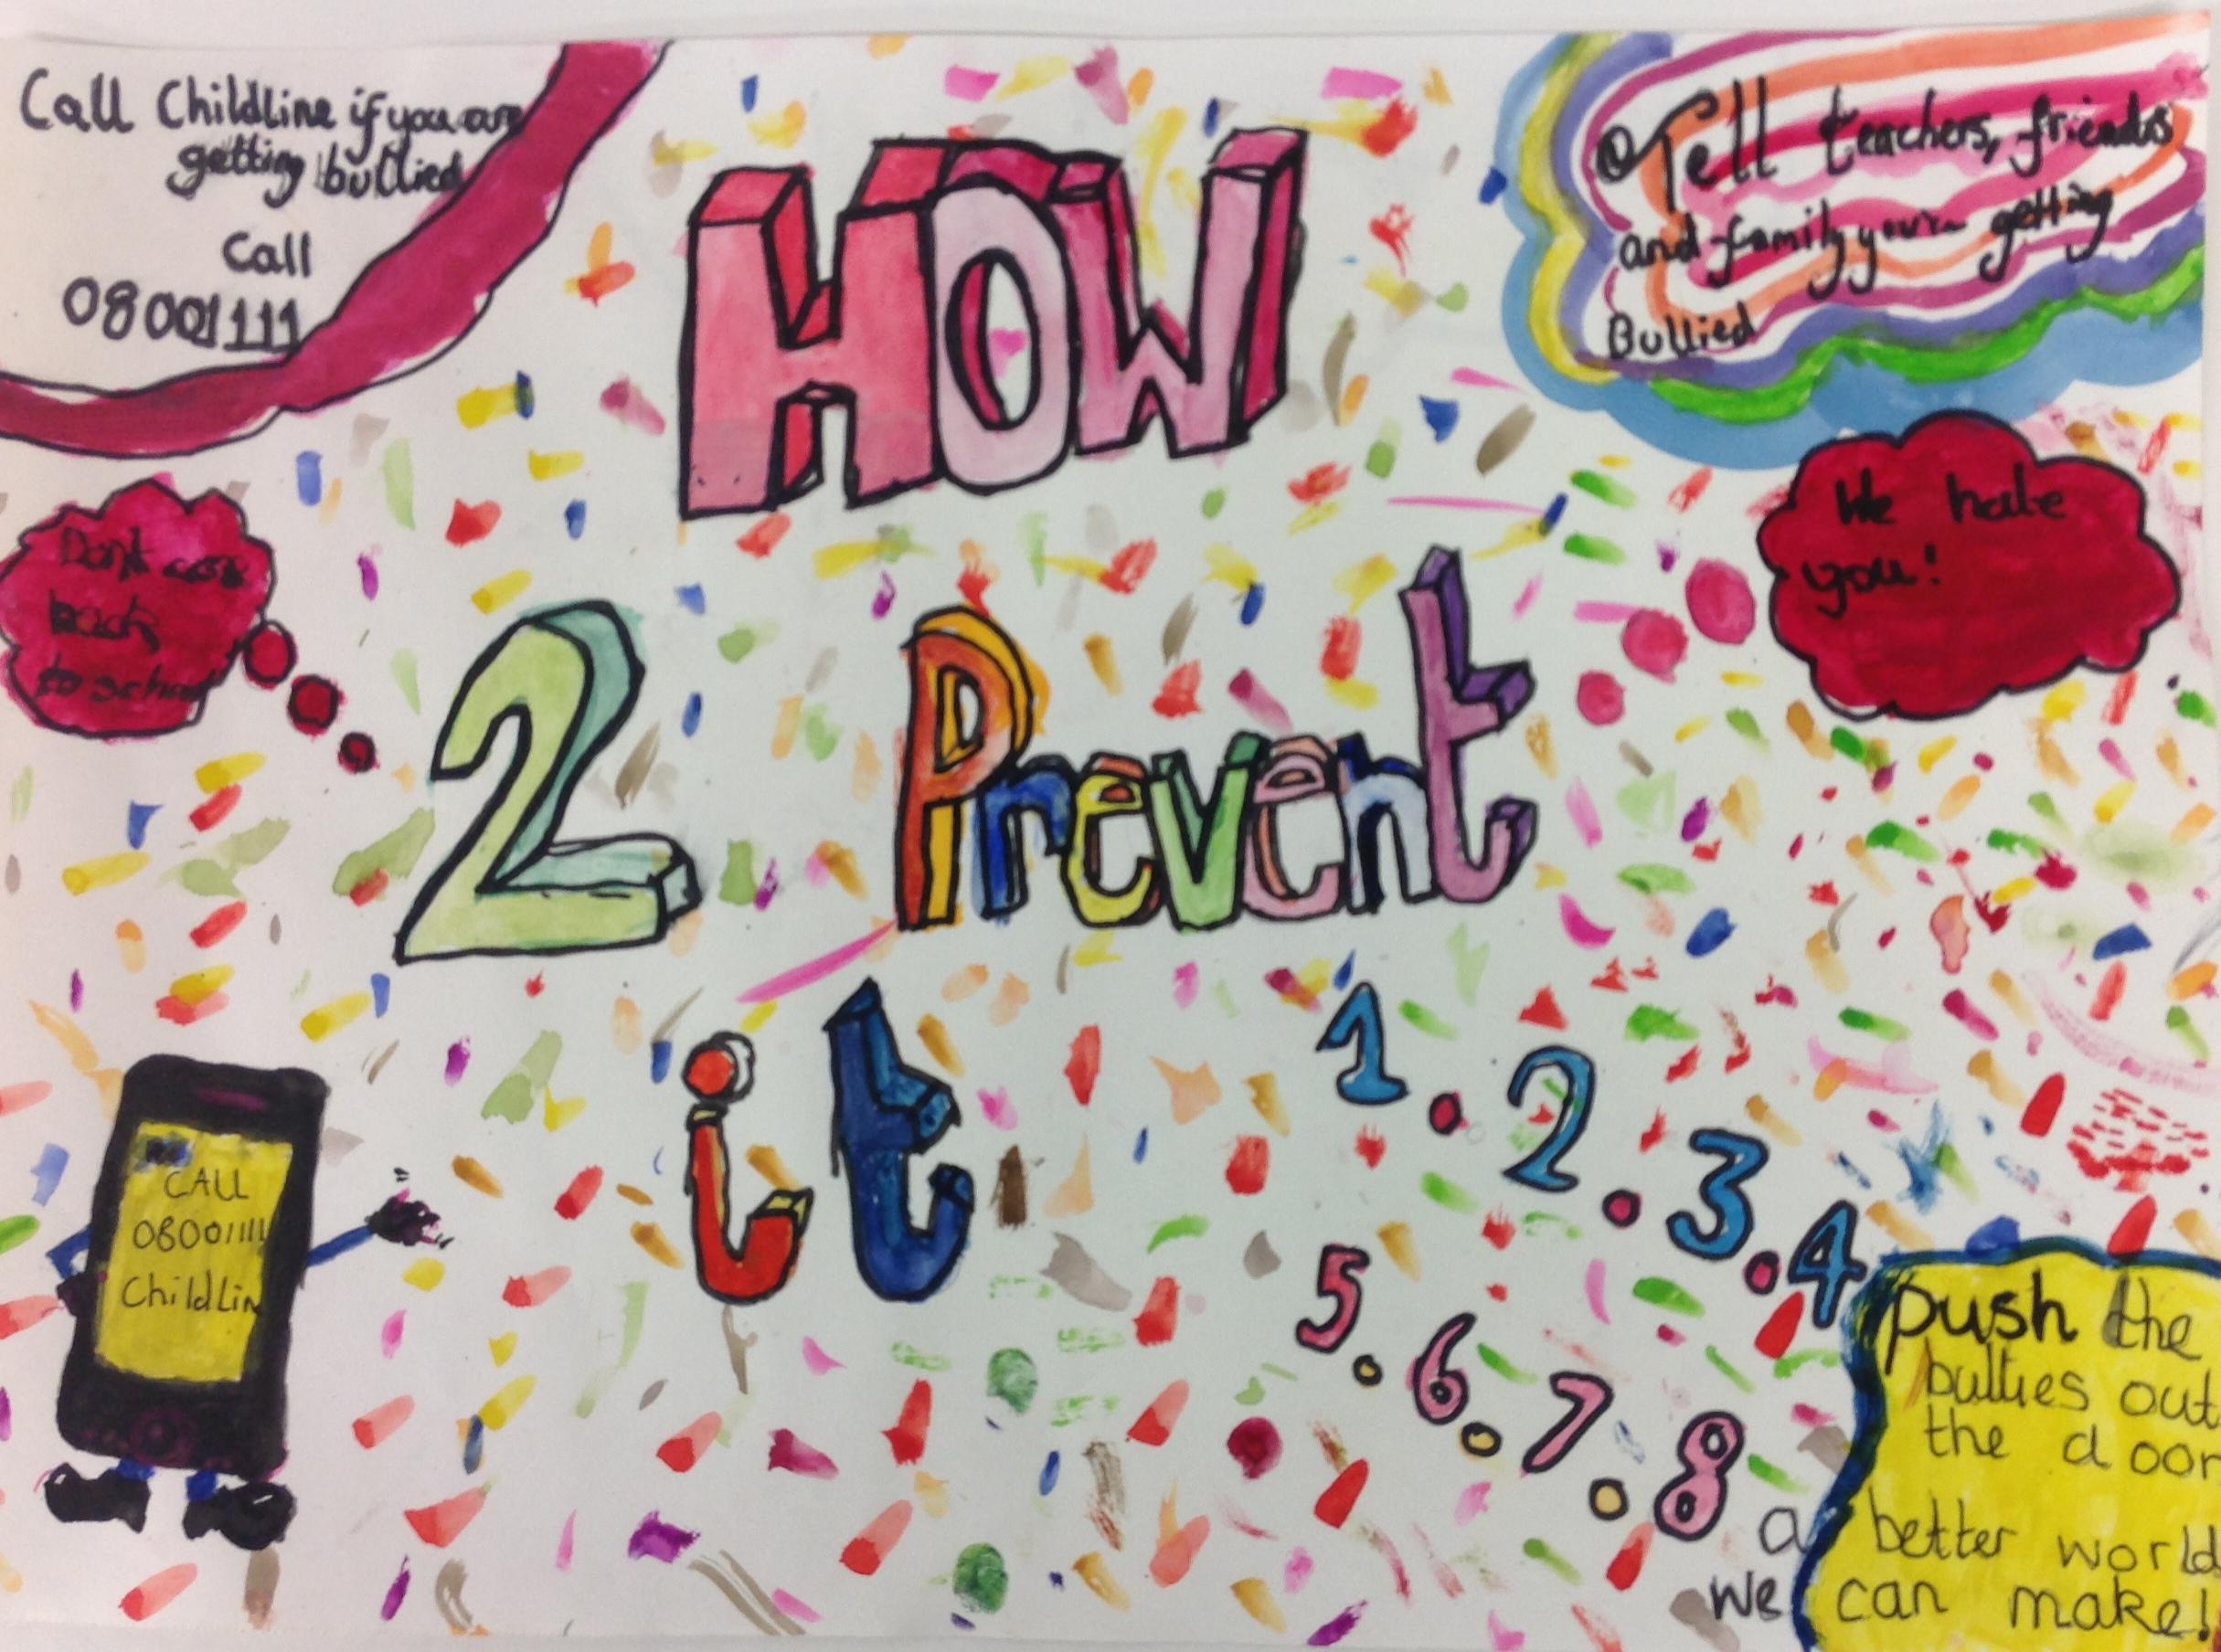 Drawn poster cyberbullying Cyberbullying who are ways tutor